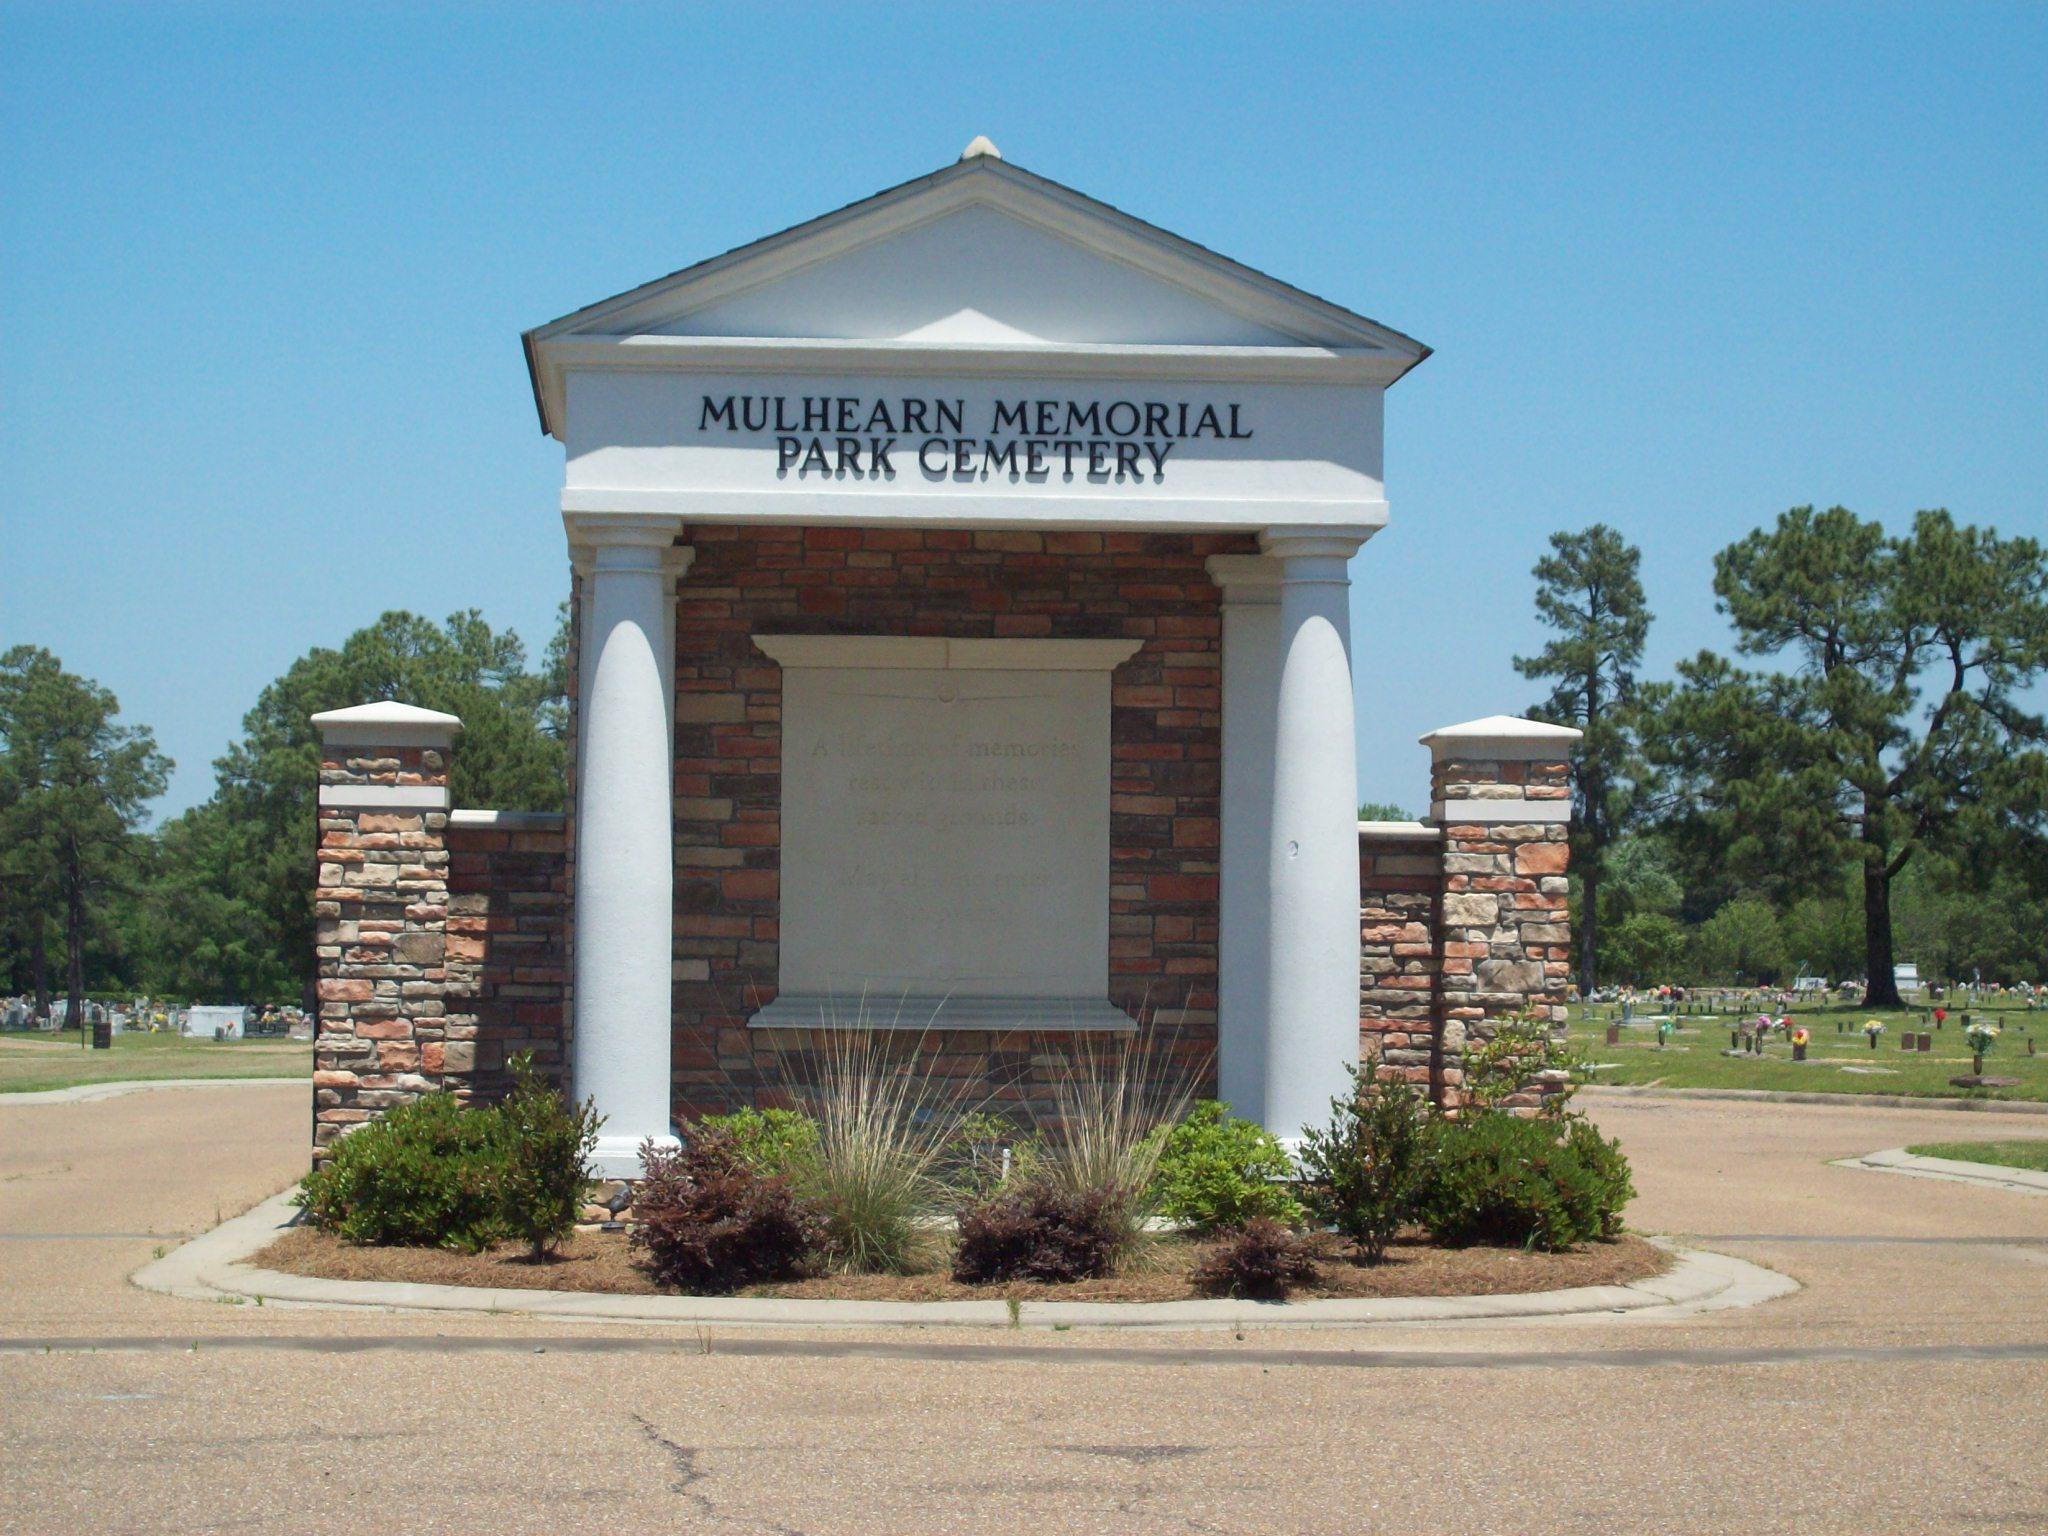 Mulhearn Memorial Park Cemetery